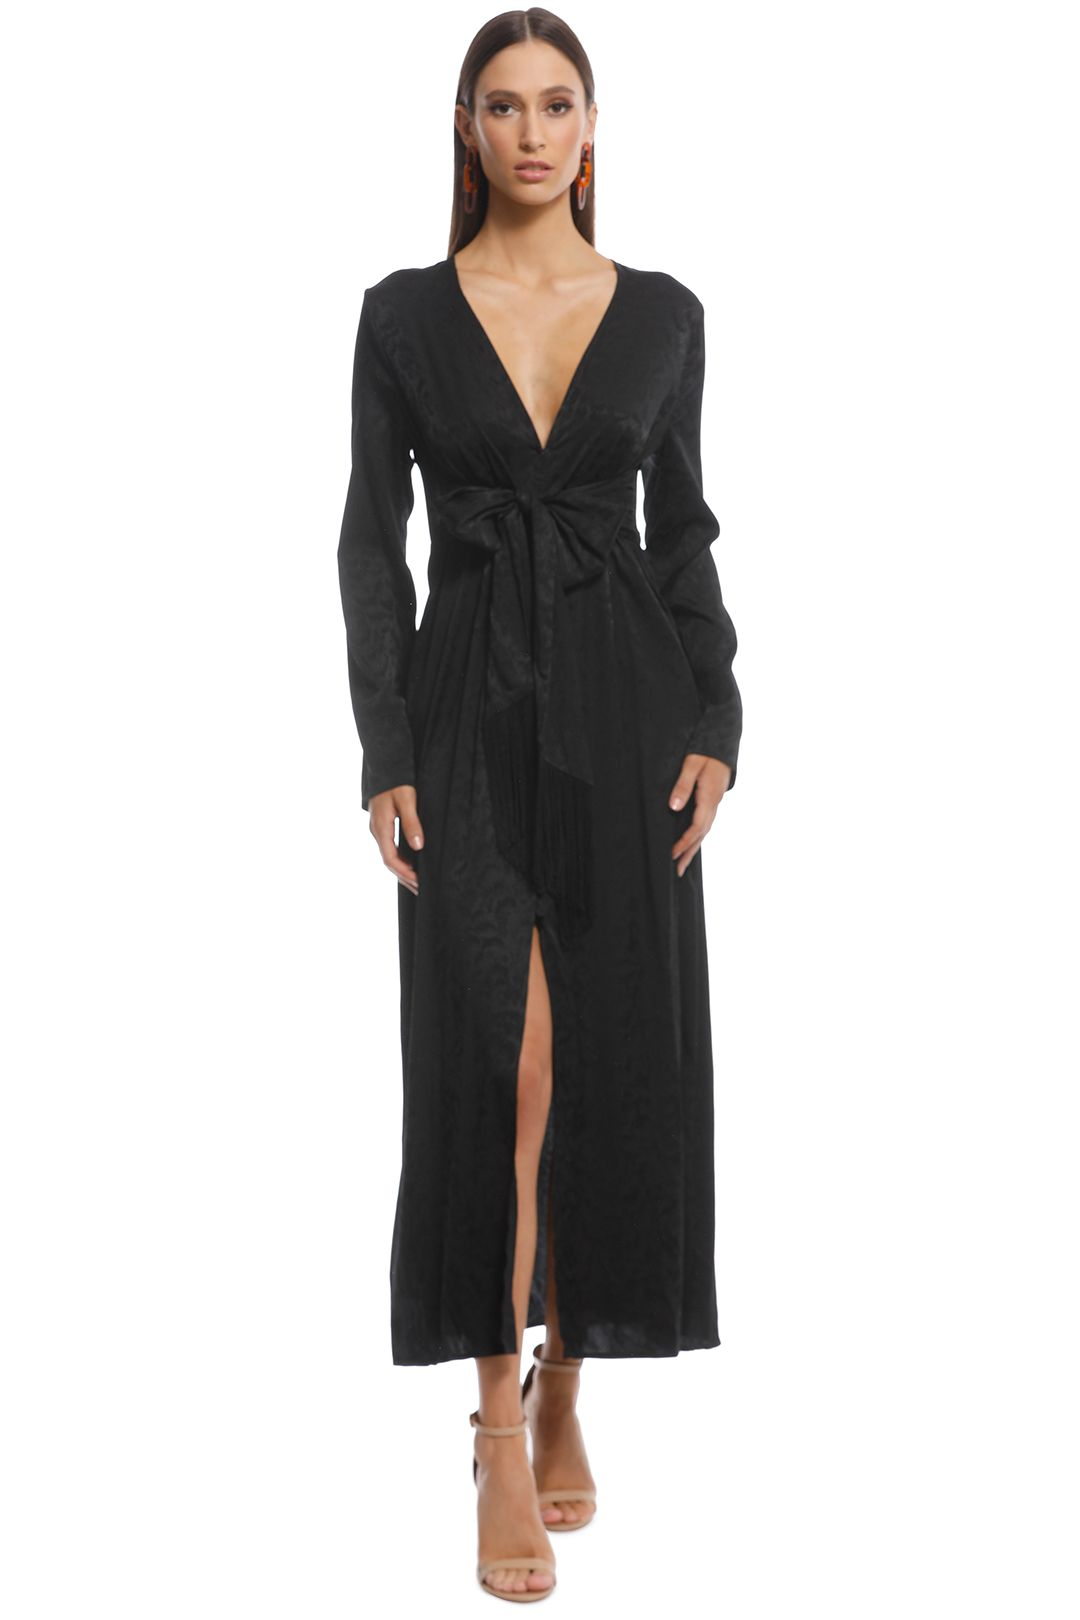 Thurley - Violeta Dress - Black - Front